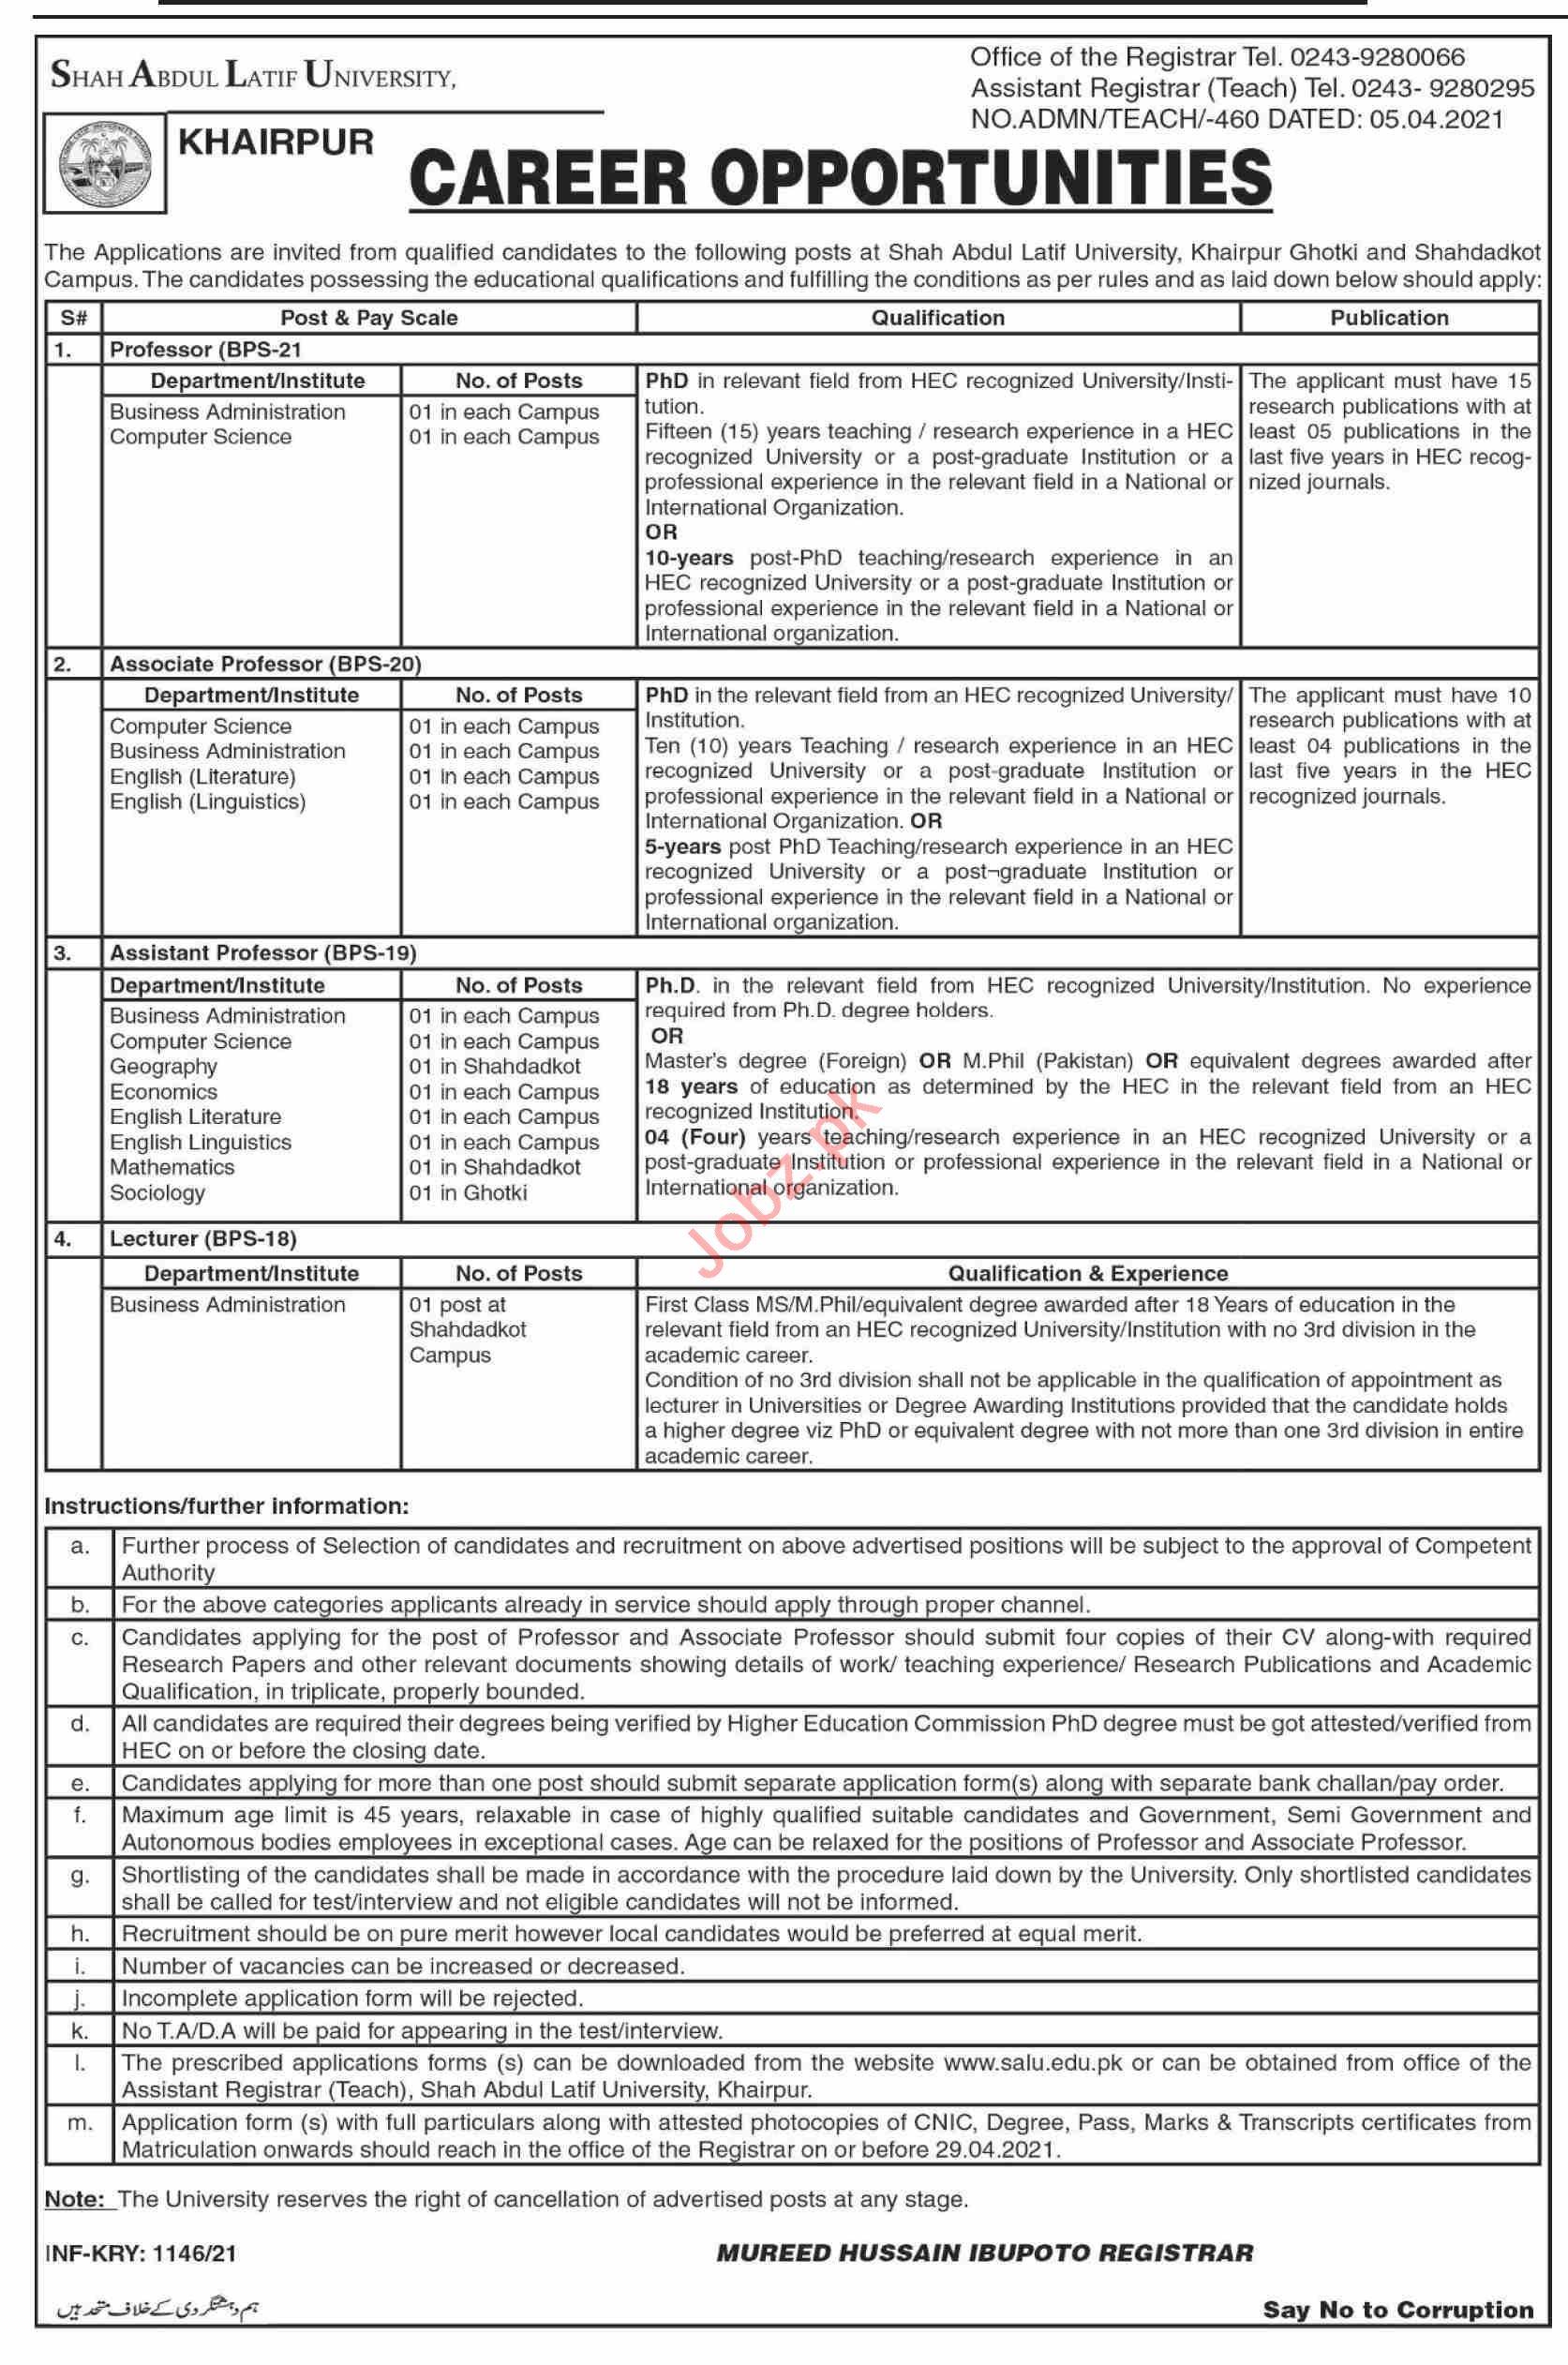 Shah Abdul Latif University SALU Khairpur Faculty Jobs 2021